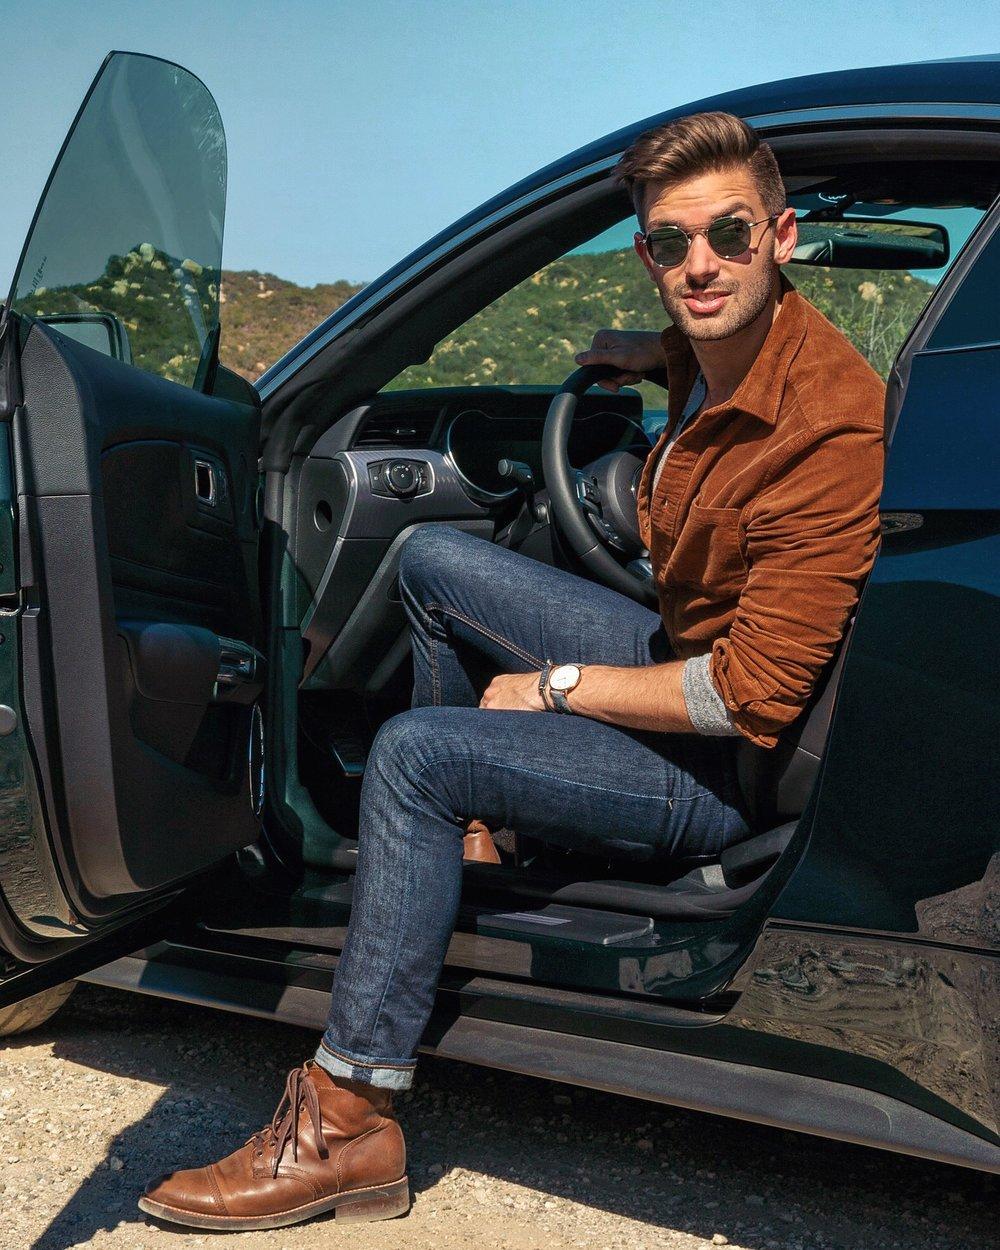 Ford Mustang Bullitt with Bang&Olufsen audio system | The Modern Otter